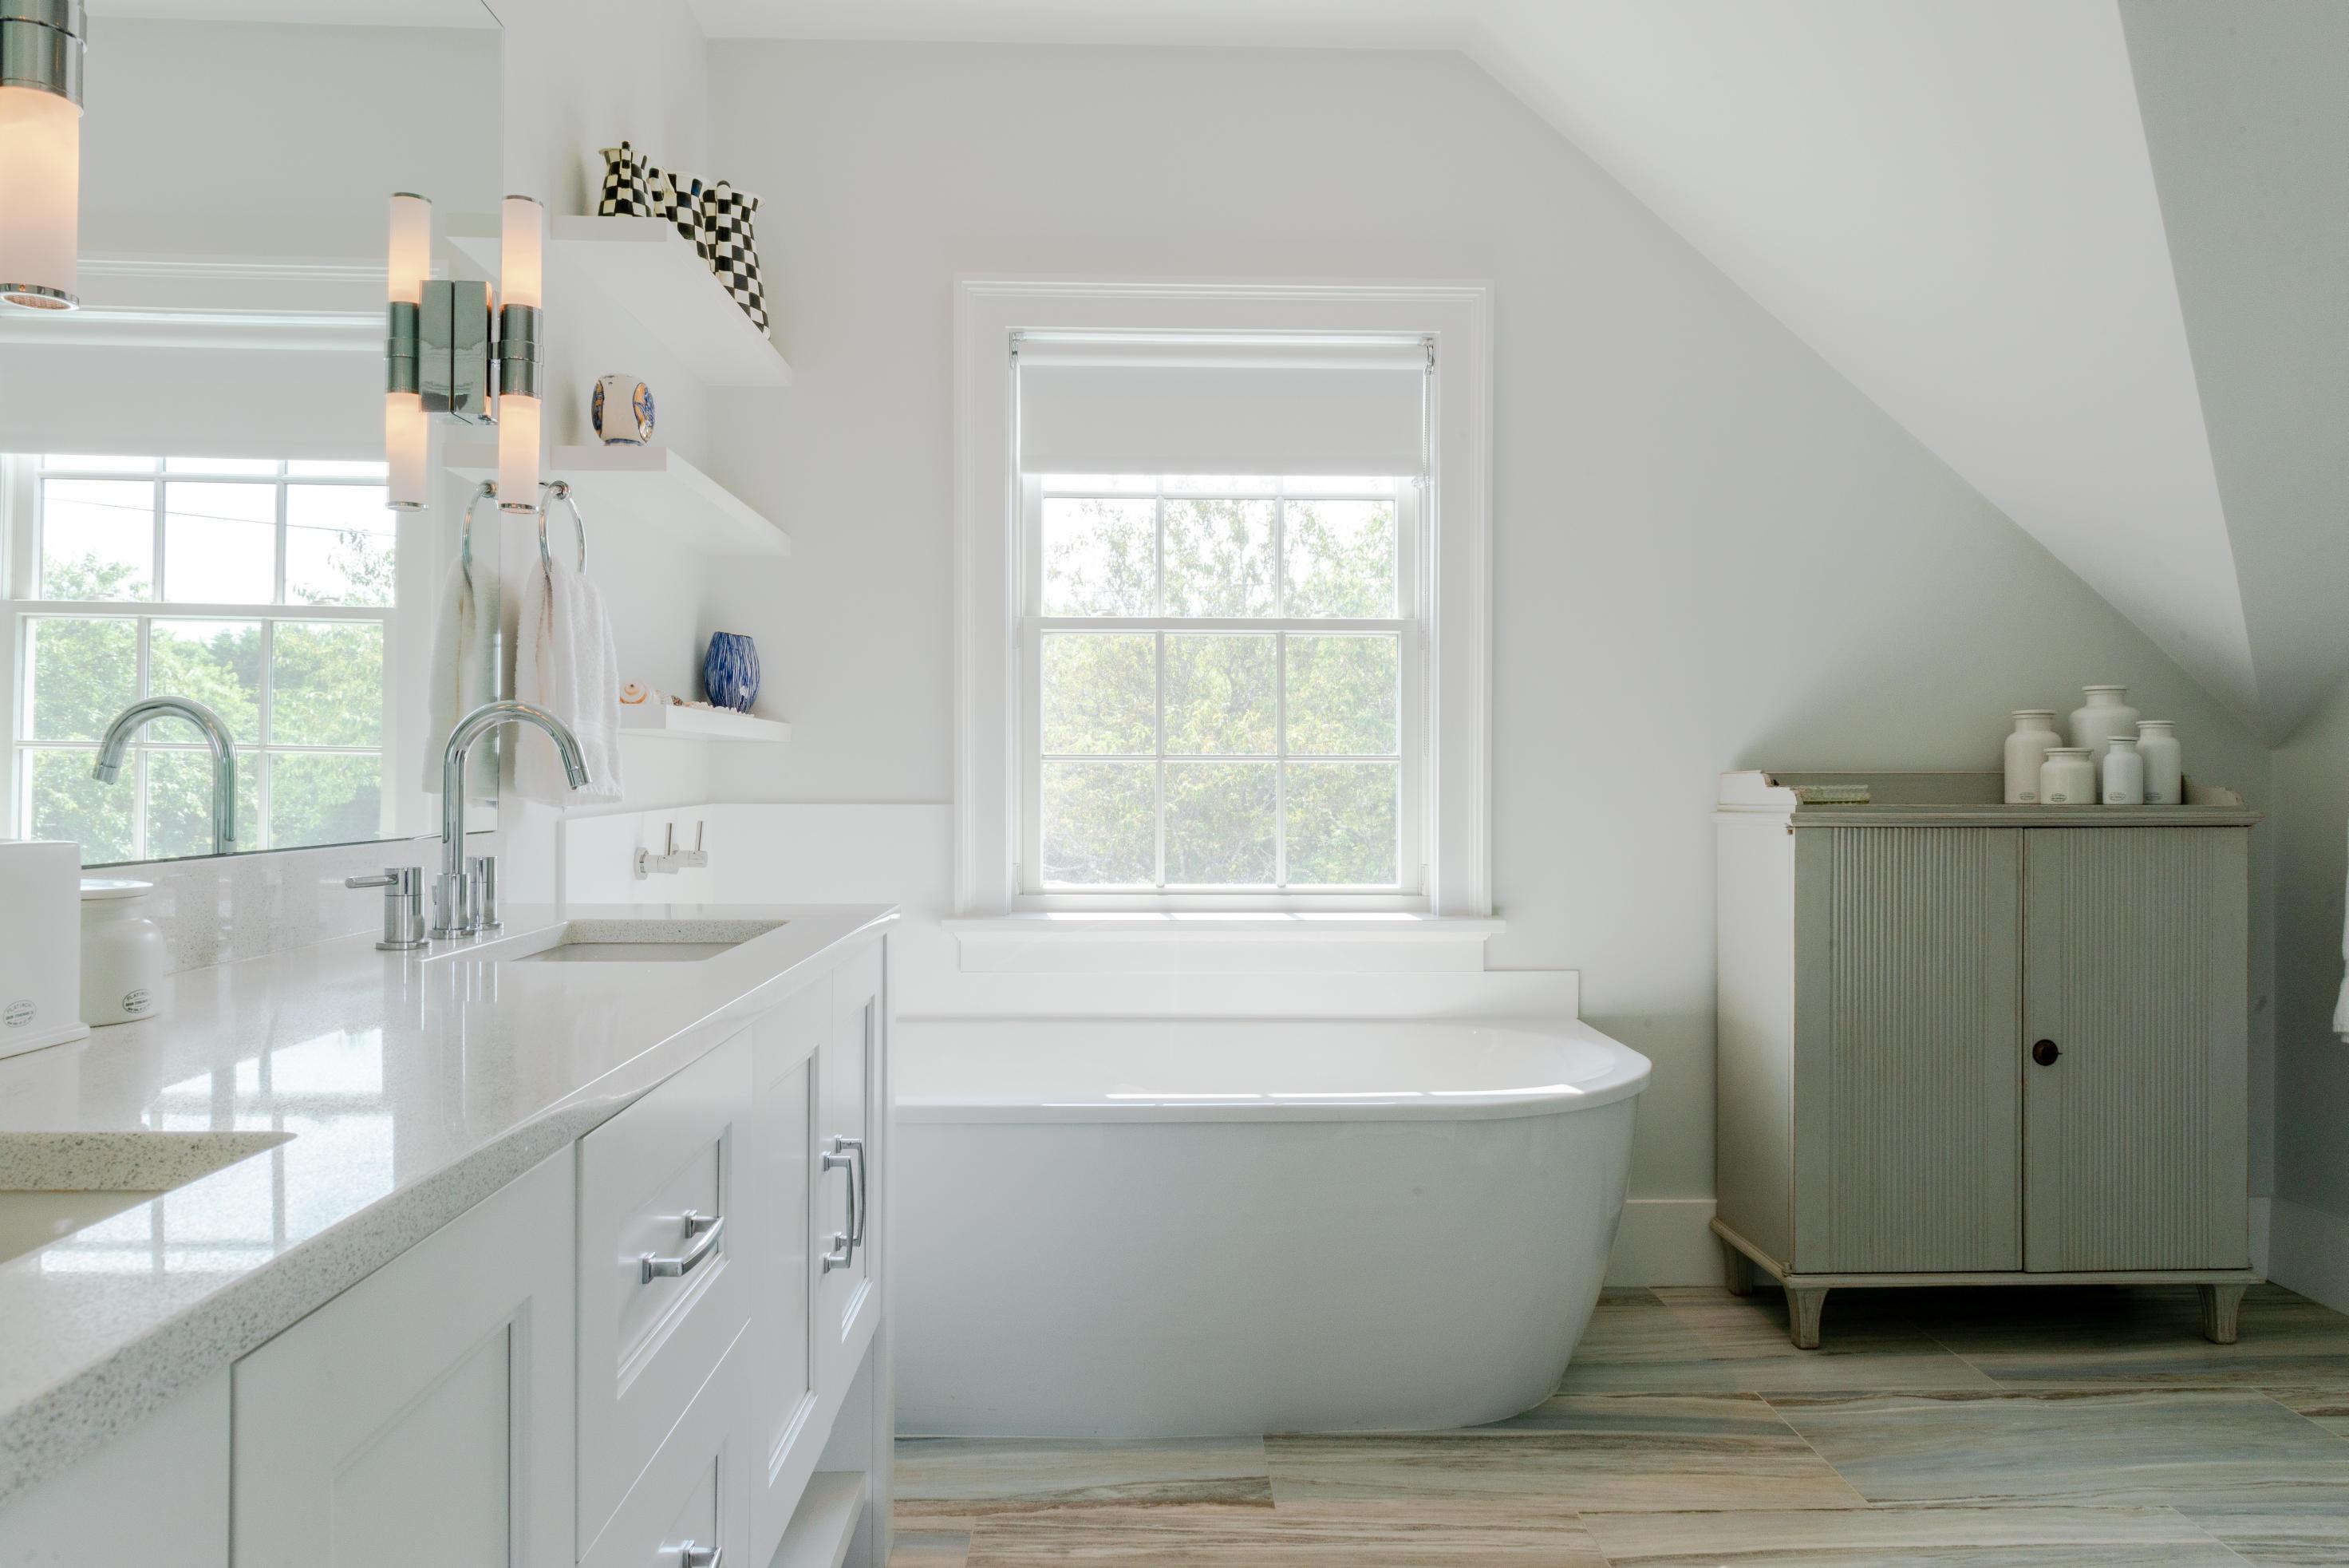 71 Vestal Street, Nantucket, Massachusetts, 02554, 5 Bedrooms Bedrooms, ,5 BathroomsBathrooms,Residential,For Sale,71 Vestal Street,21906096